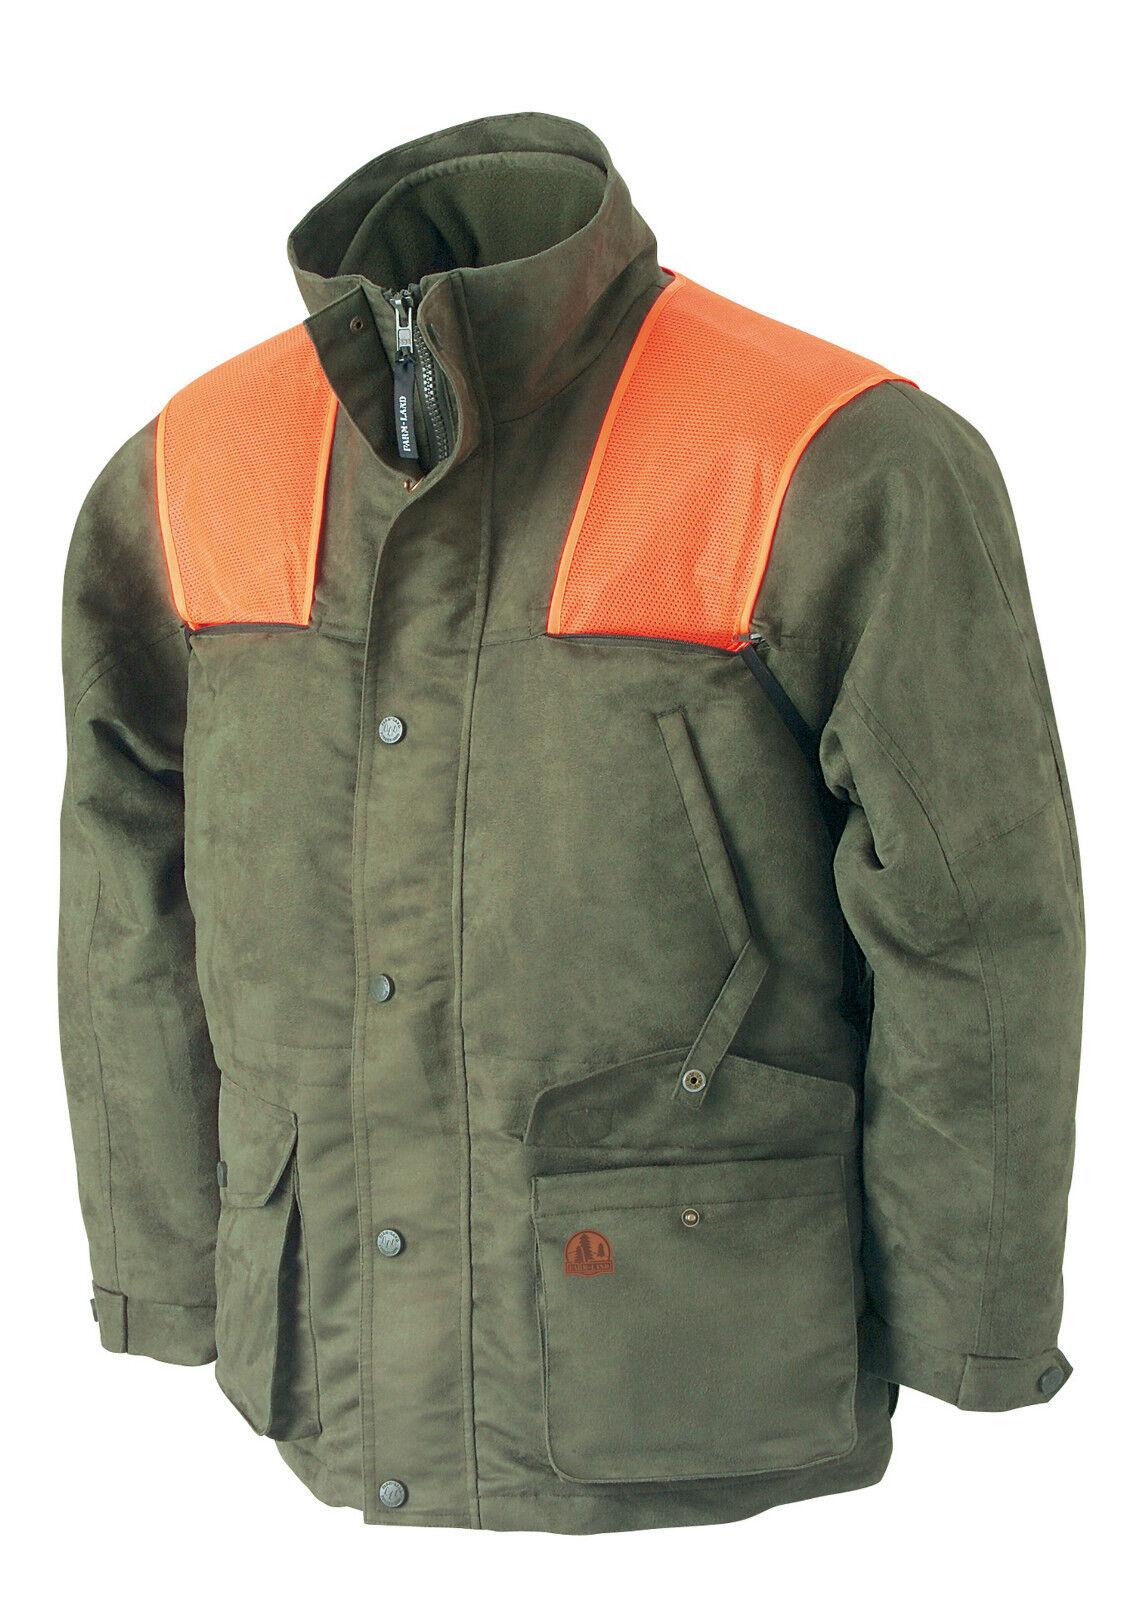 Farm-país Galway chaqueta 90-3-311 verde oliva caza chaqueta función chaqueta 3in1 chaqueta